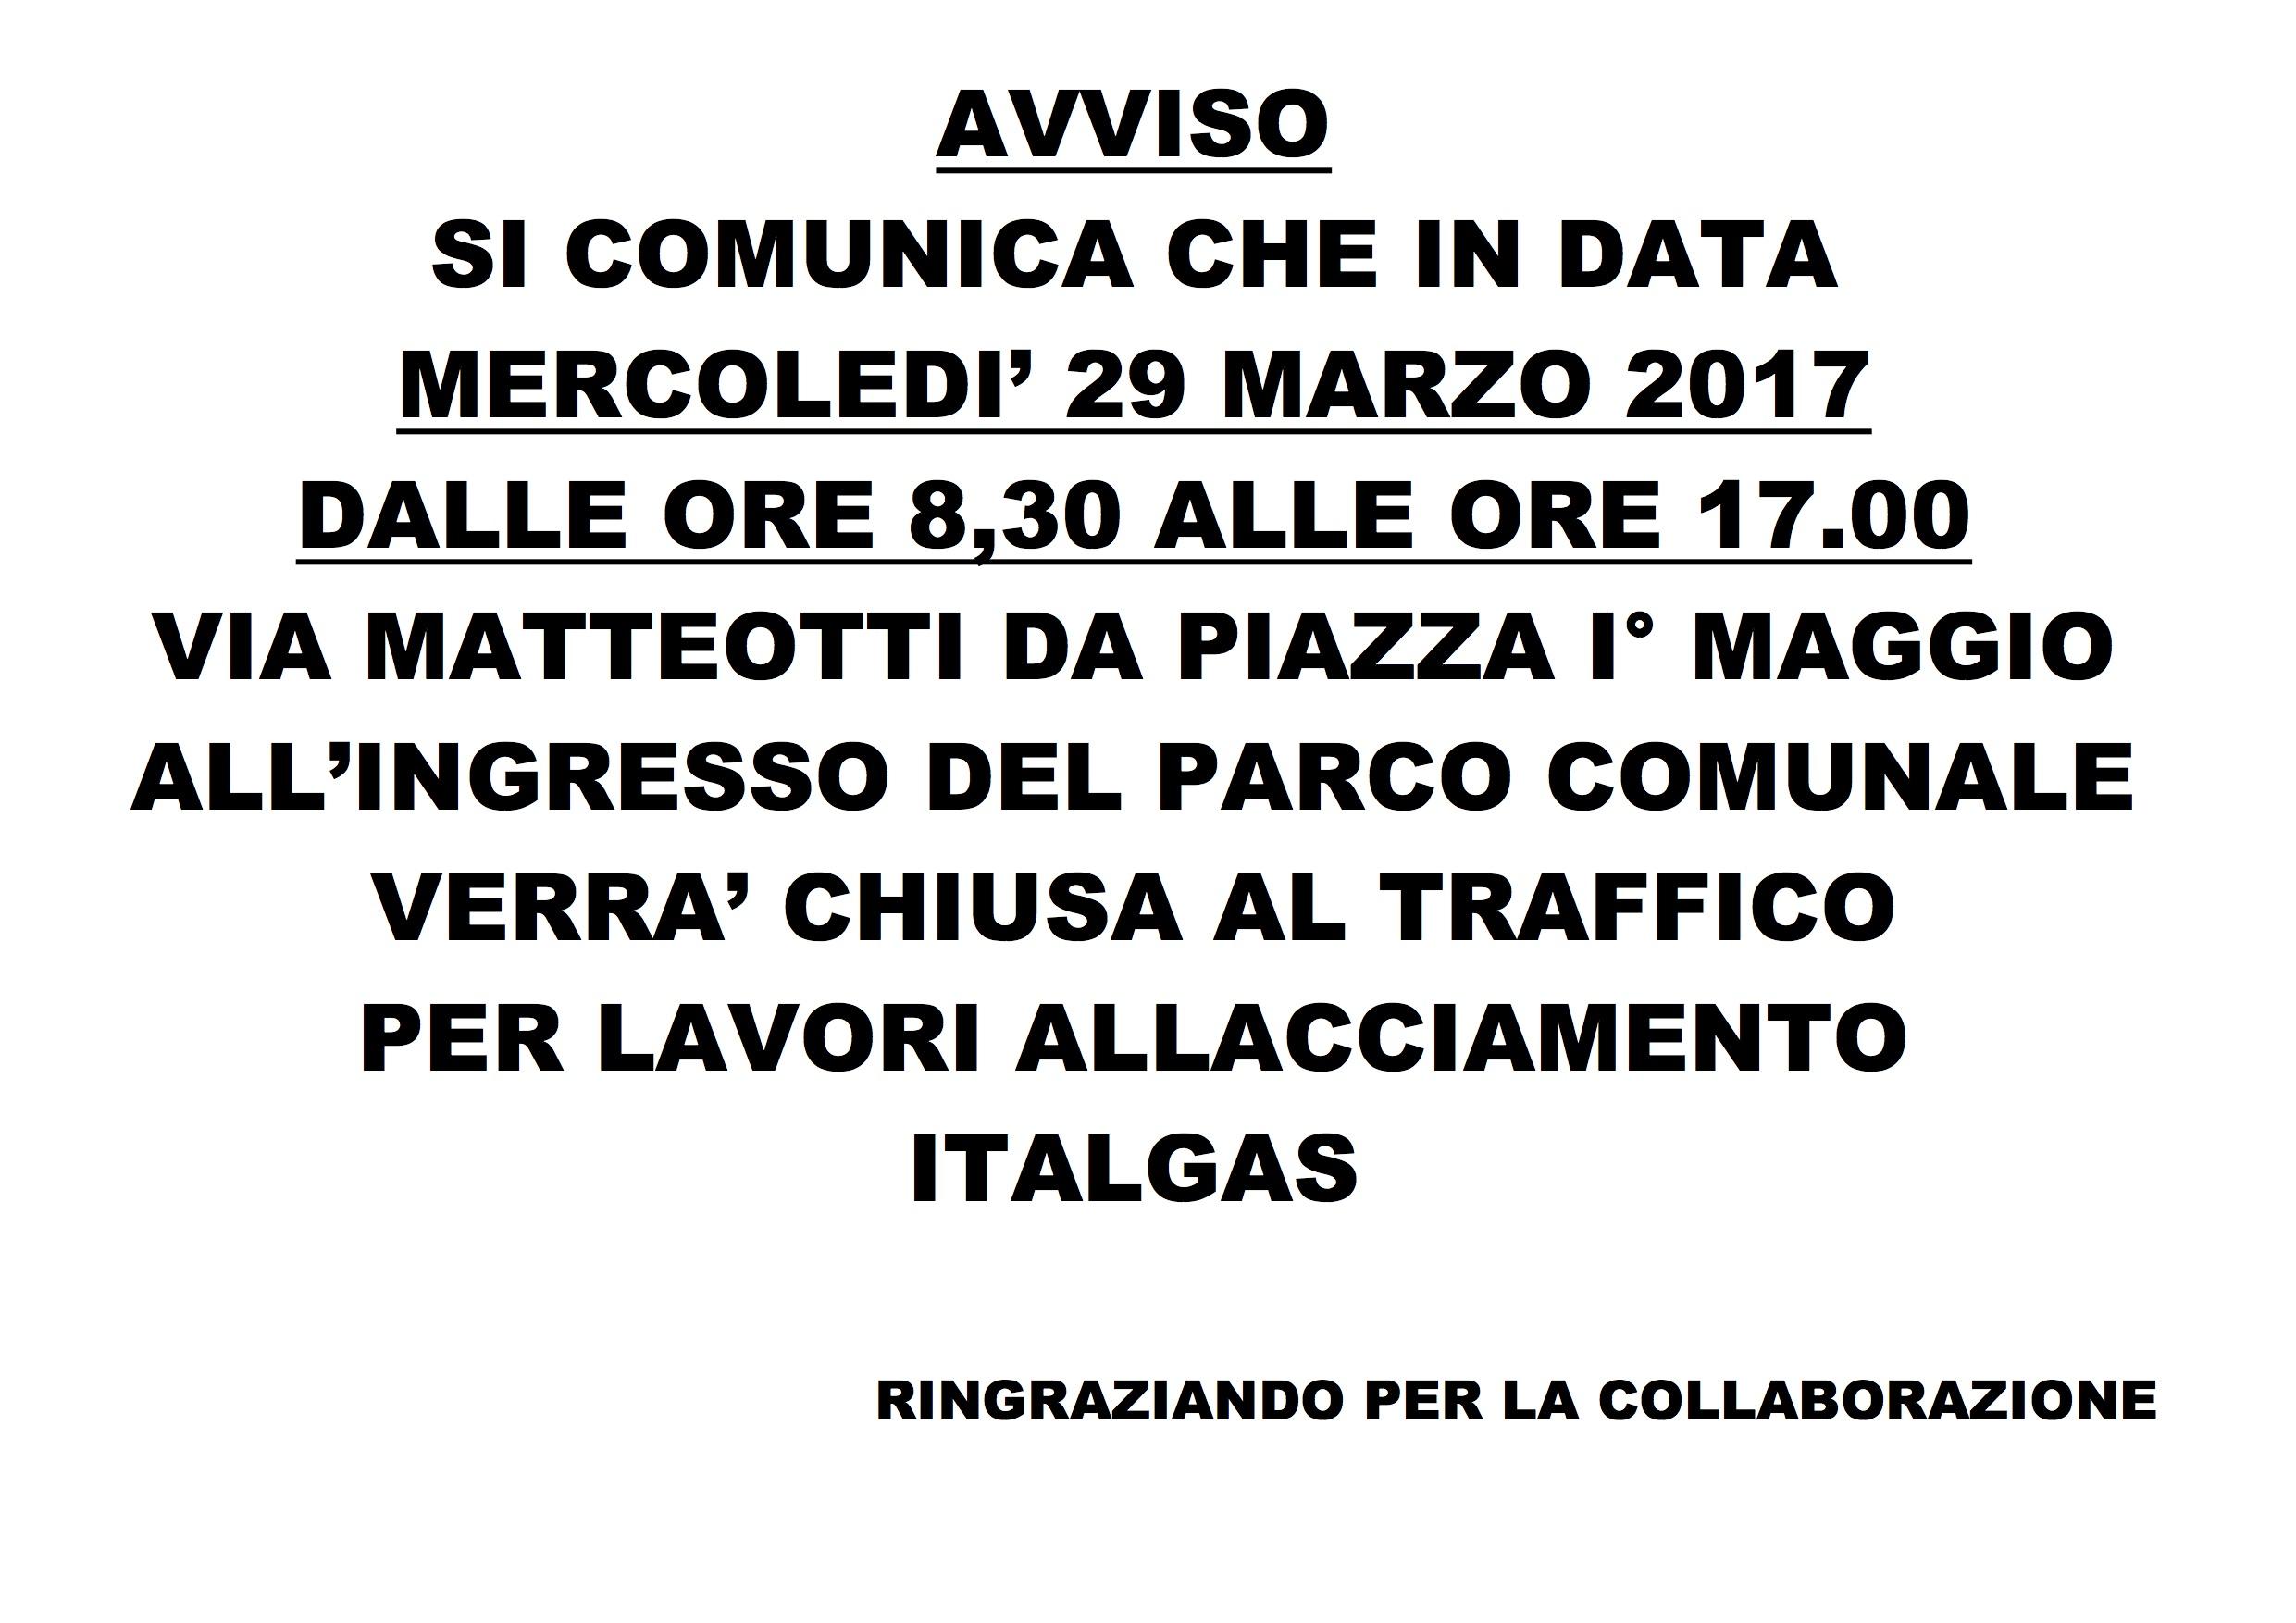 Avviso Chiusura Via Matteotti 29/03/2017